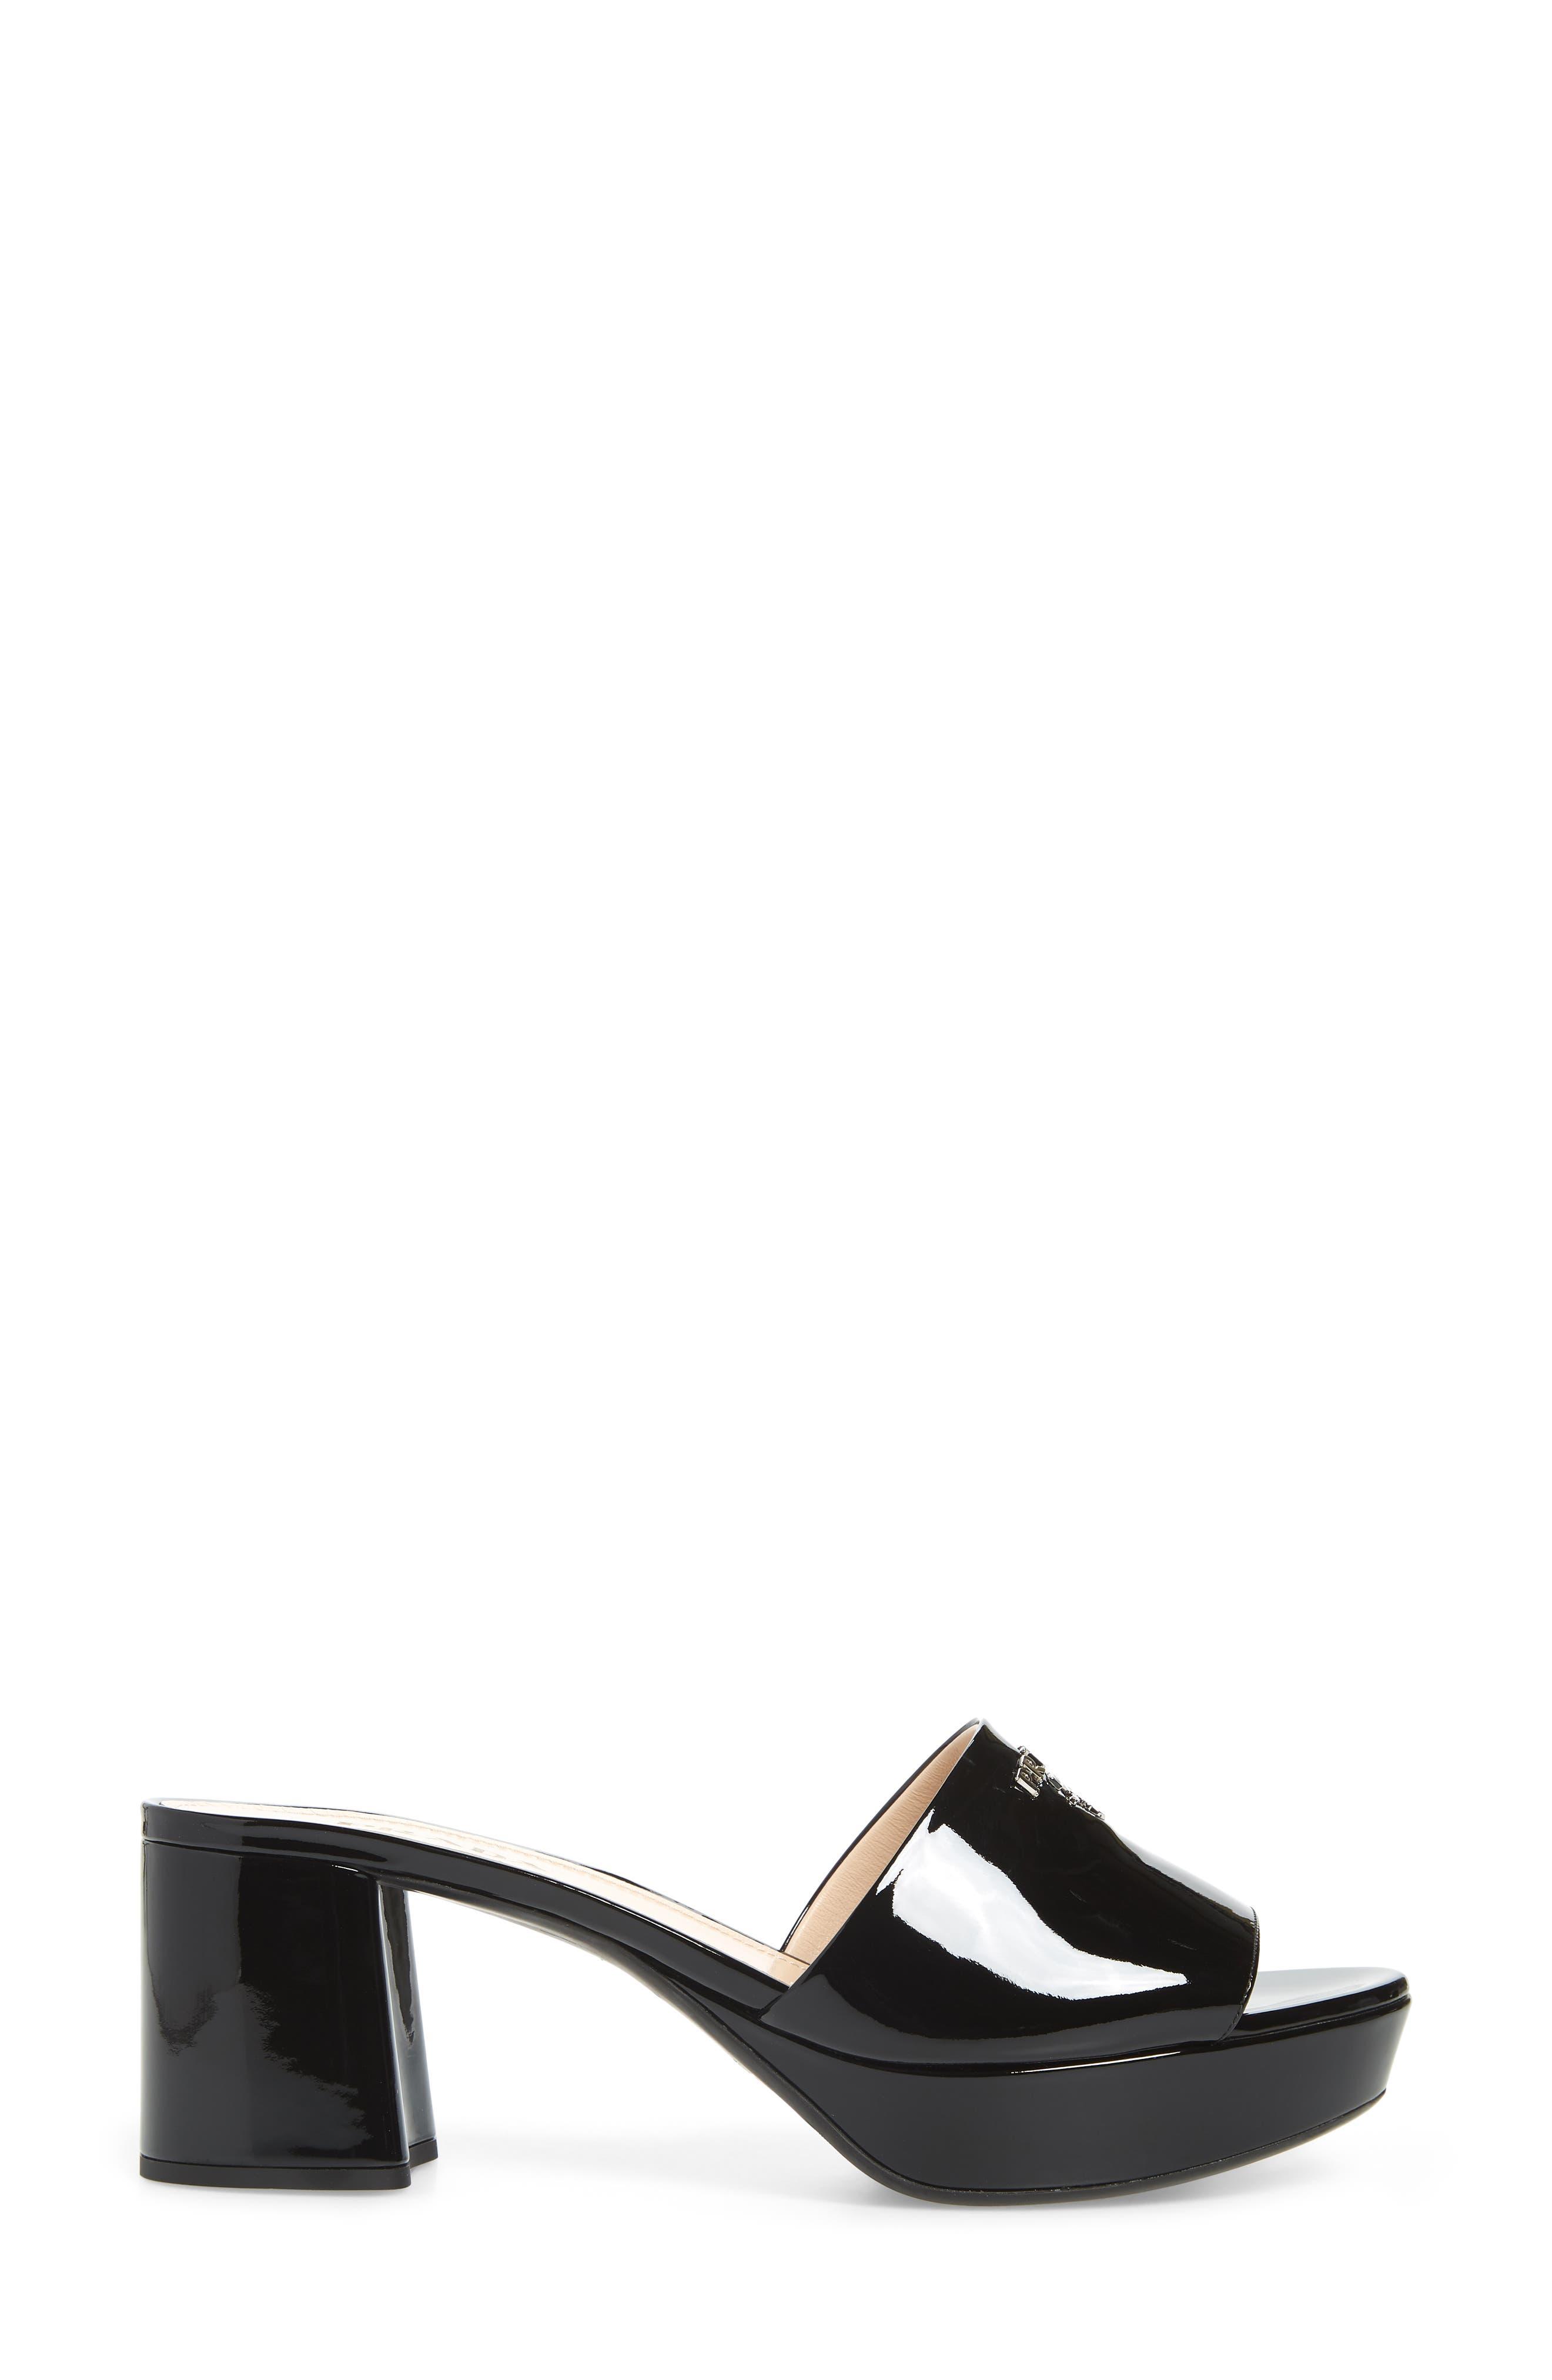 PRADA, Platform Slide Sandal, Alternate thumbnail 3, color, BLACK PATENT